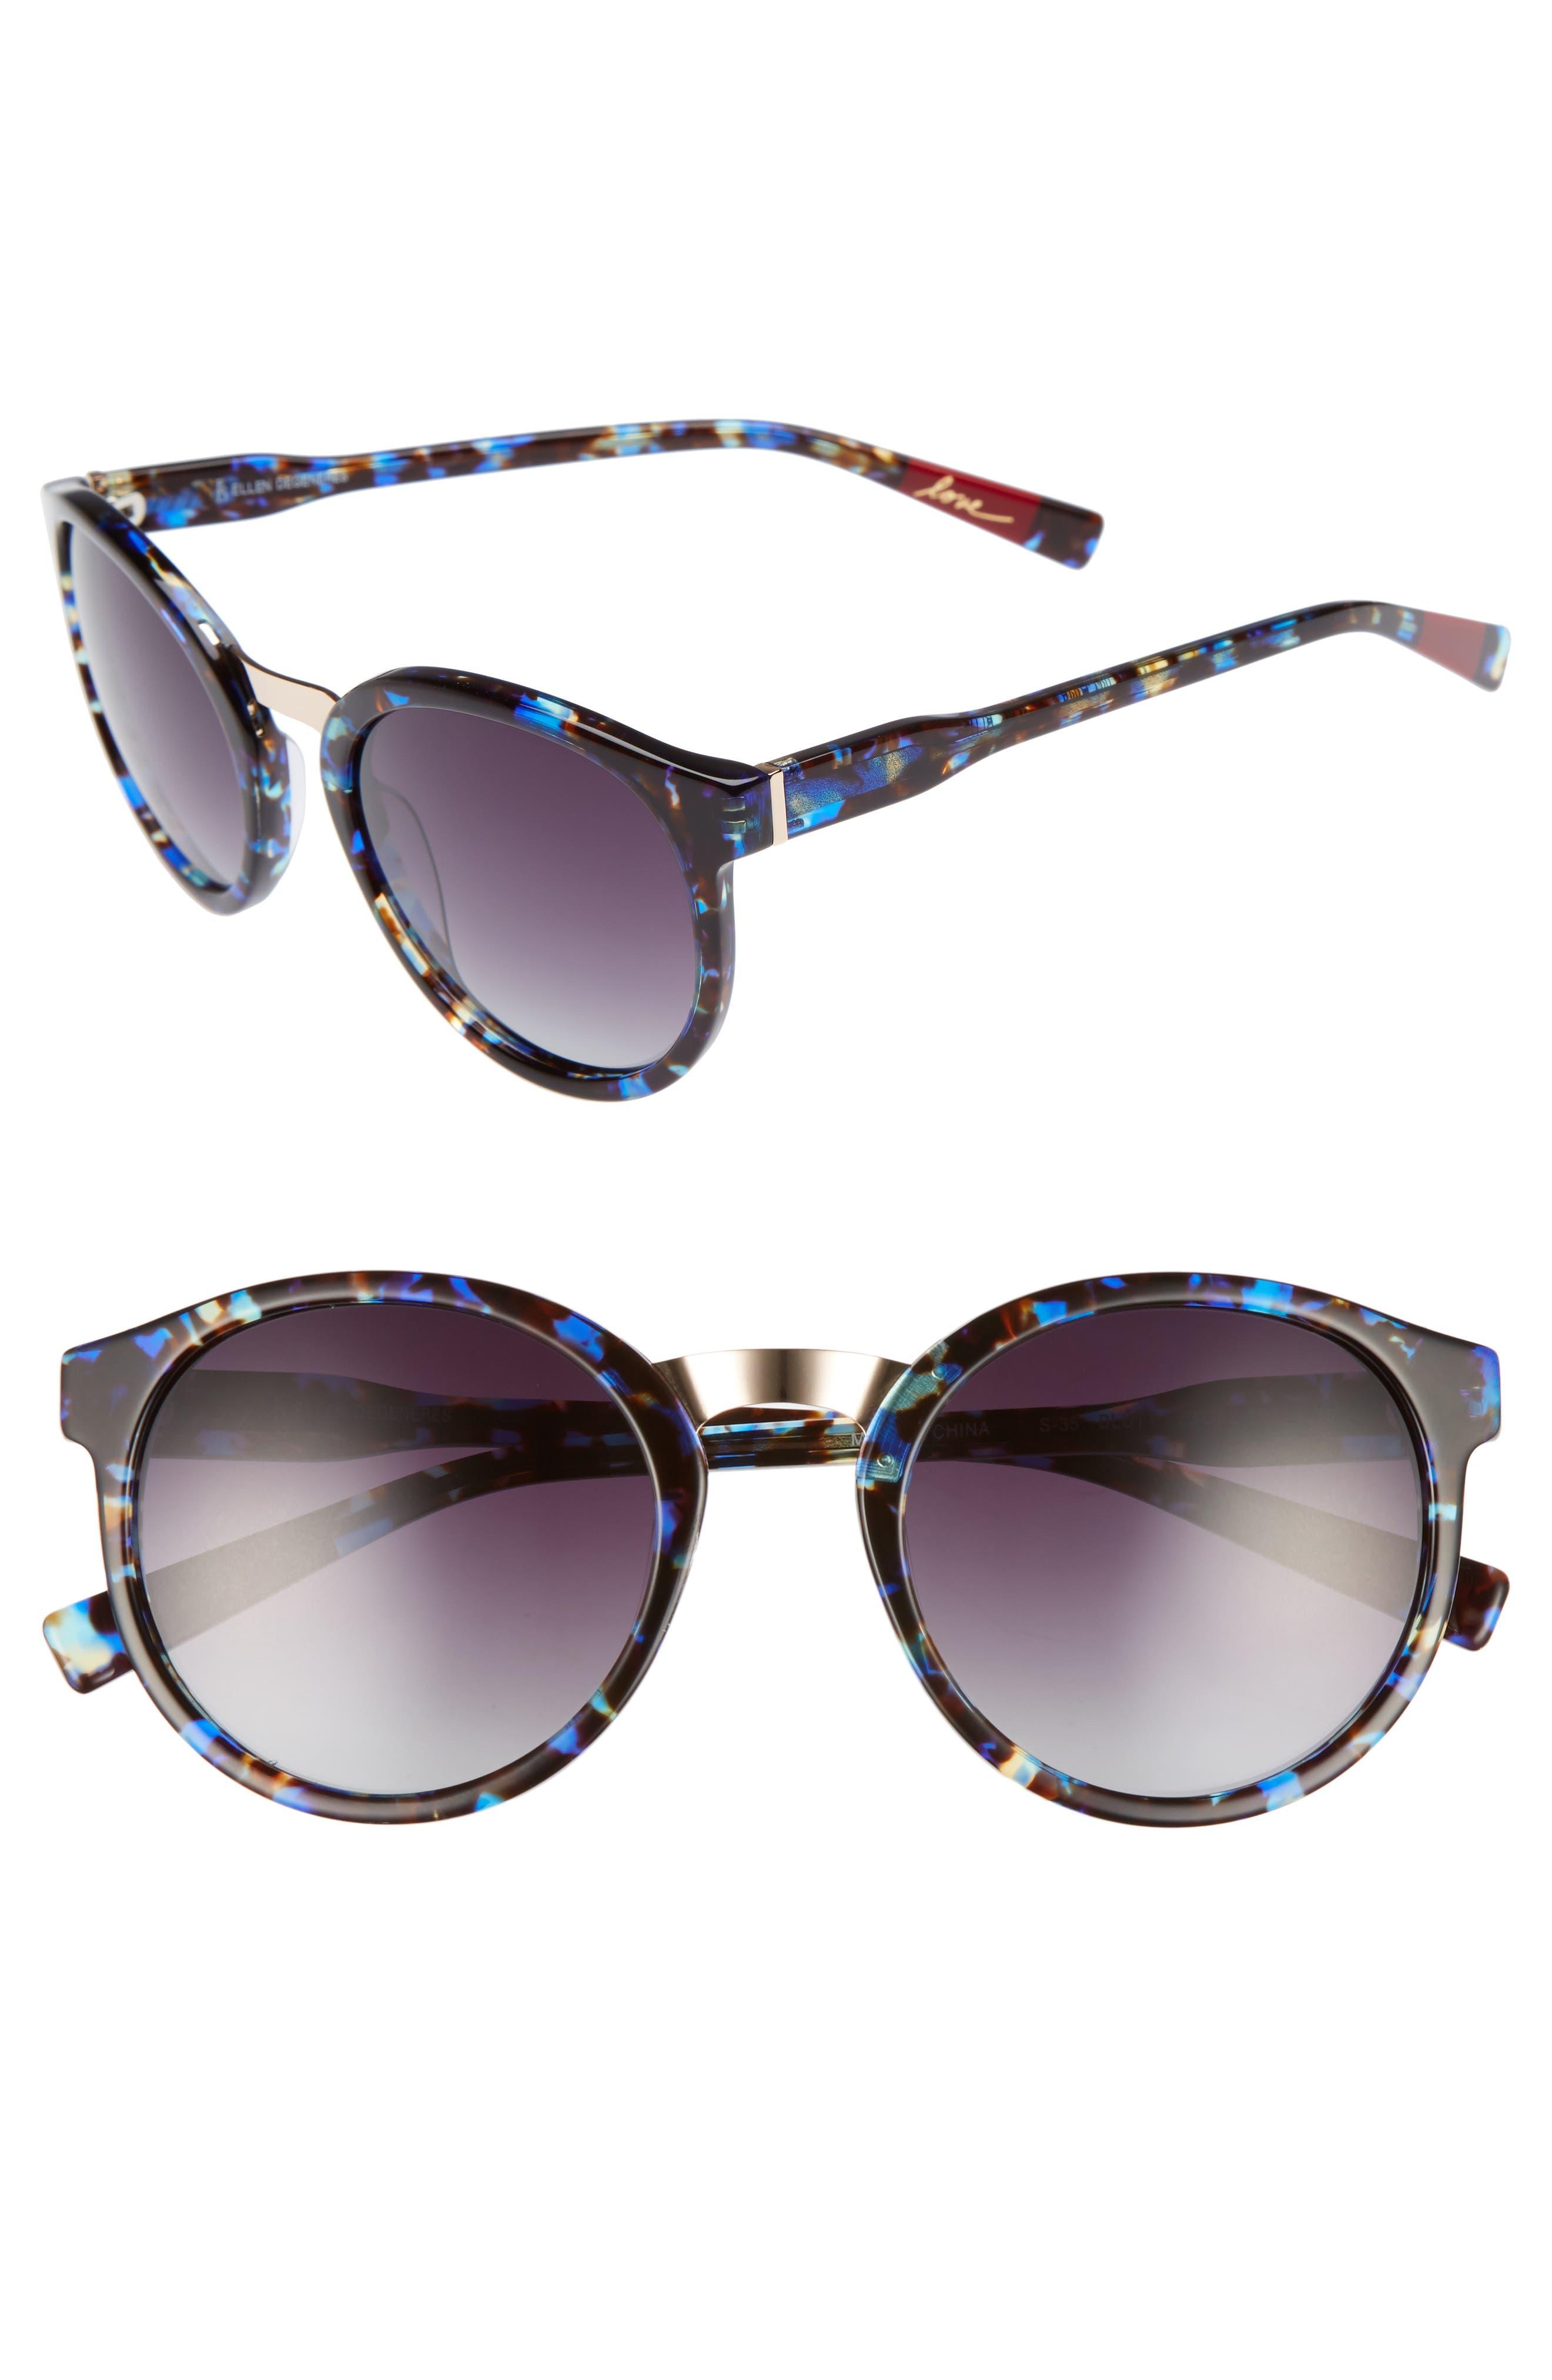 53mm Round Sunglasses,                             Main thumbnail 1, color,                             Blue Tortoise